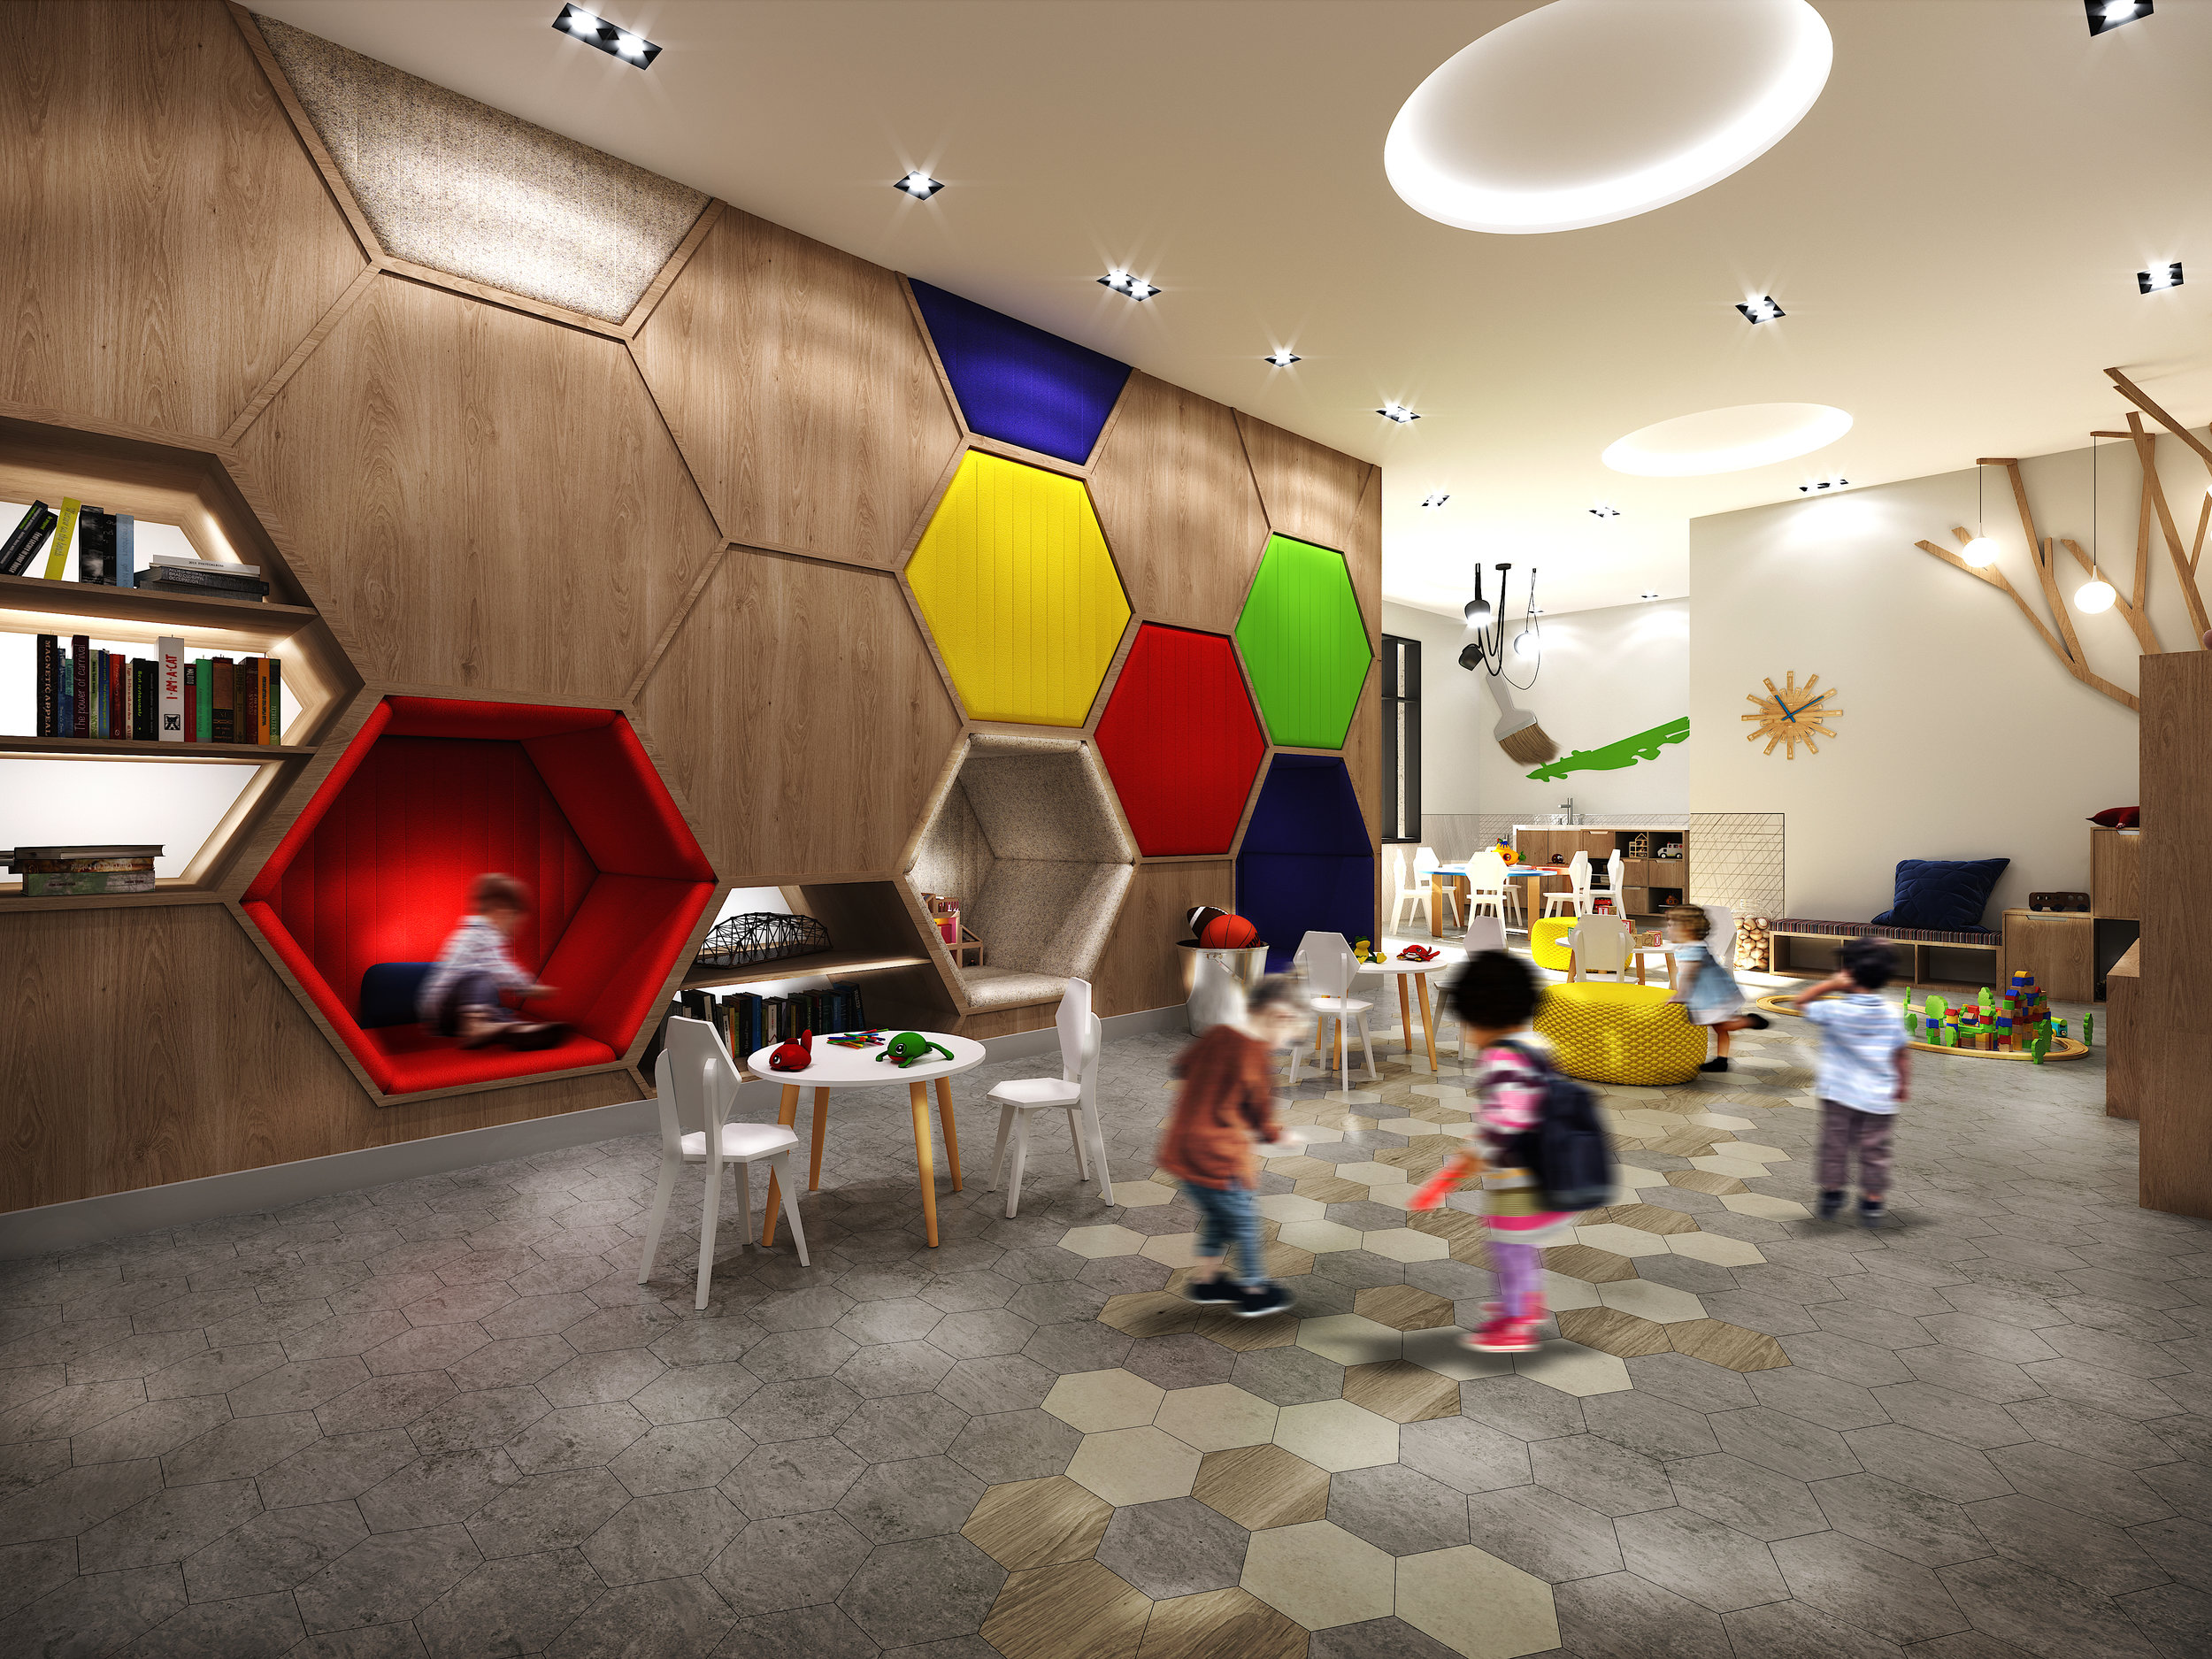 Childrens zone_CAM02_02.jpg